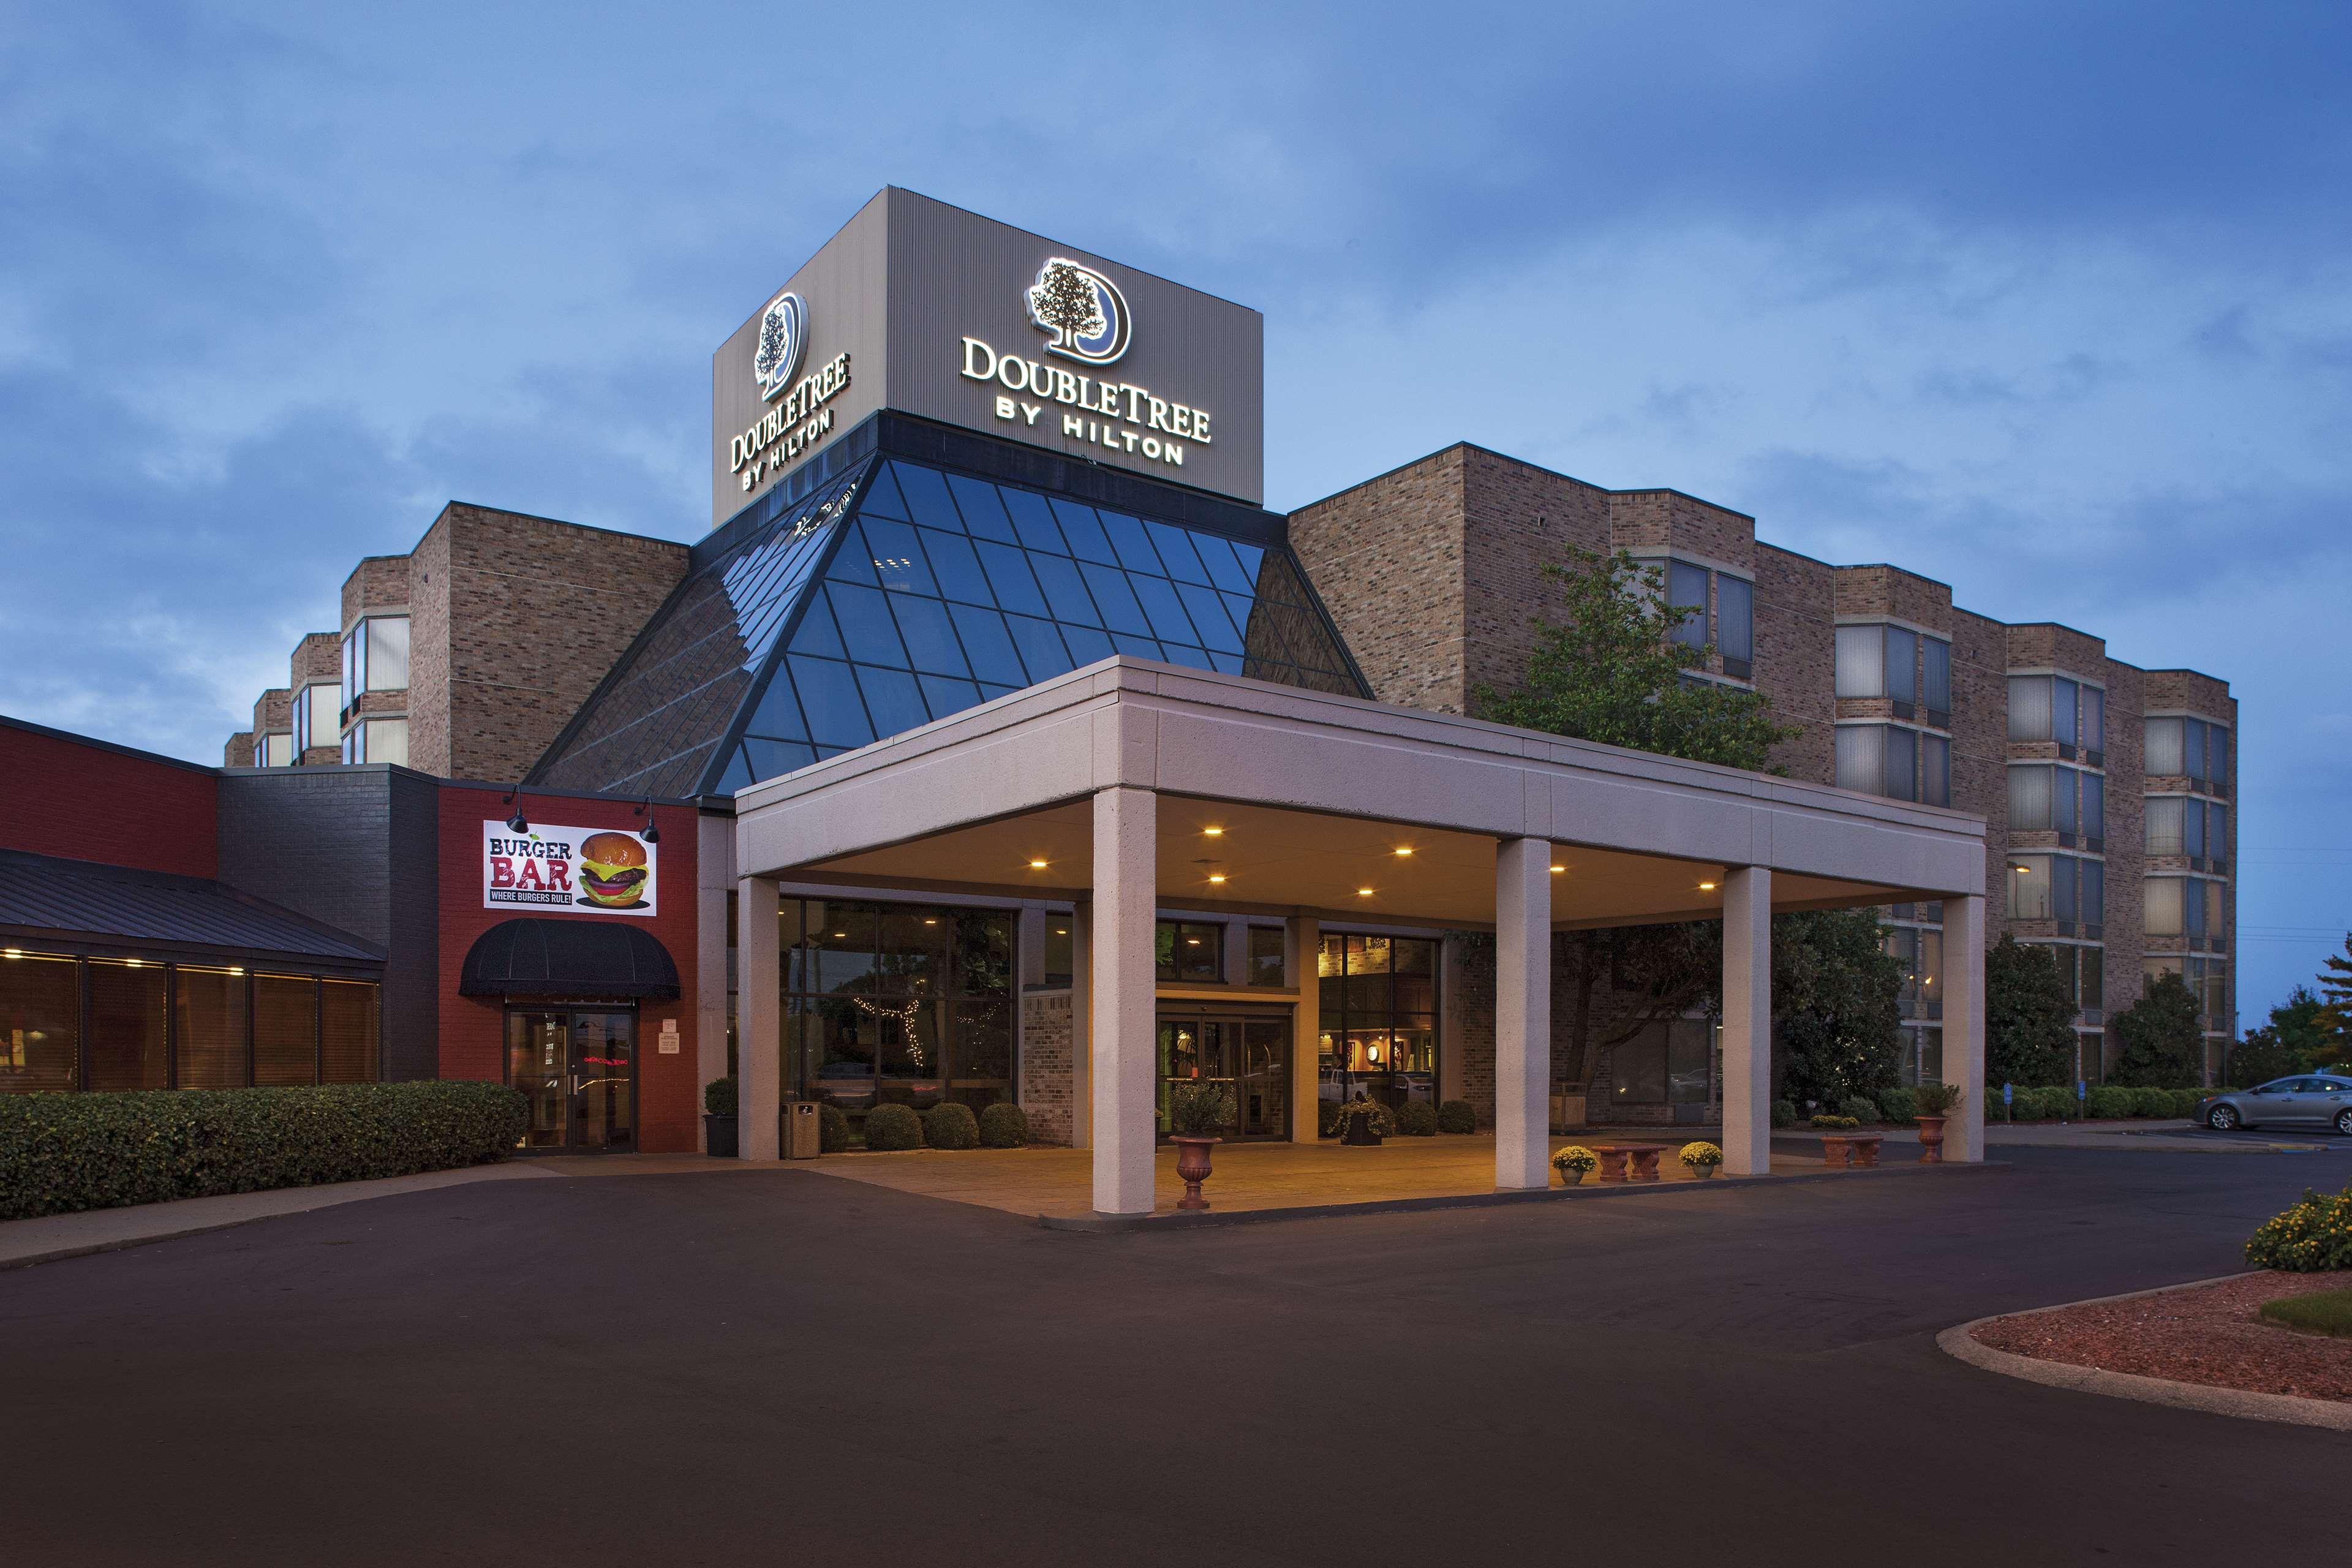 DoubleTree by Hilton Hotel Johnson City image 0